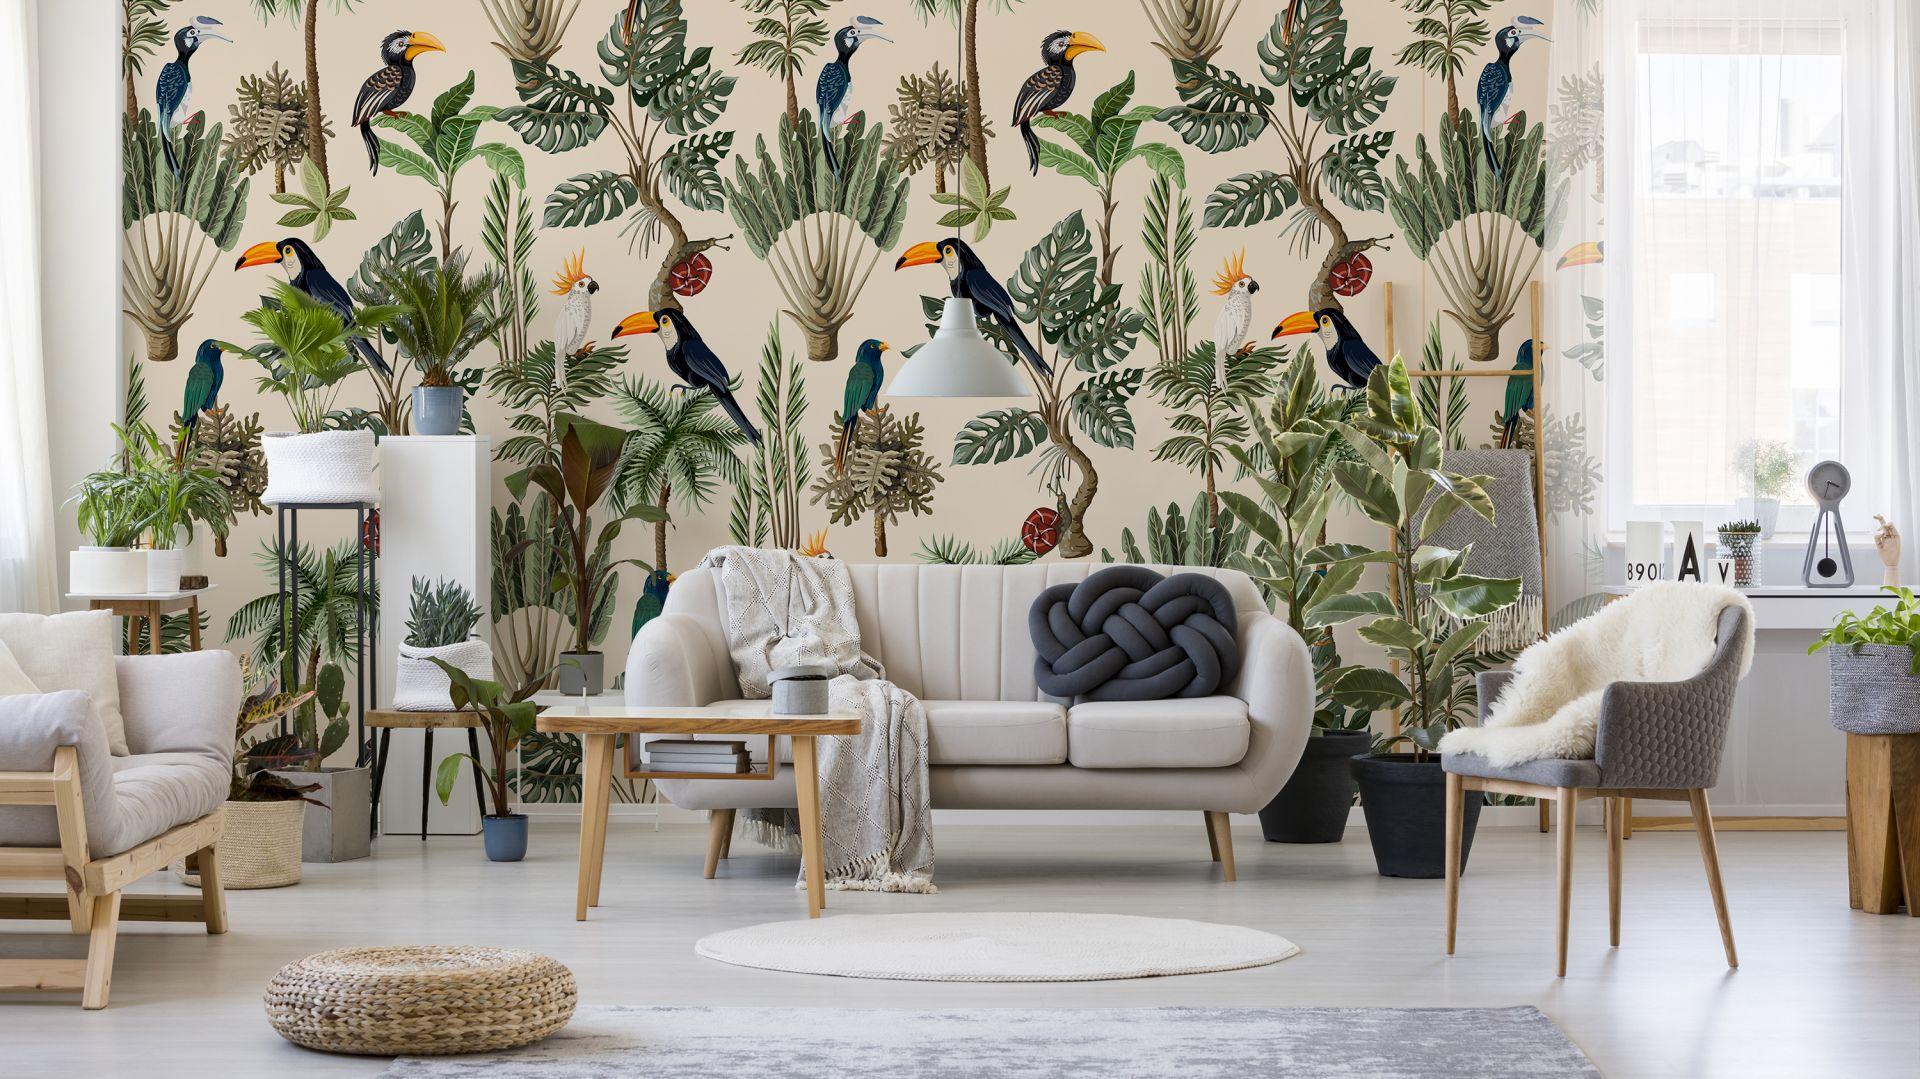 Фото-обои: джунгли и птицы